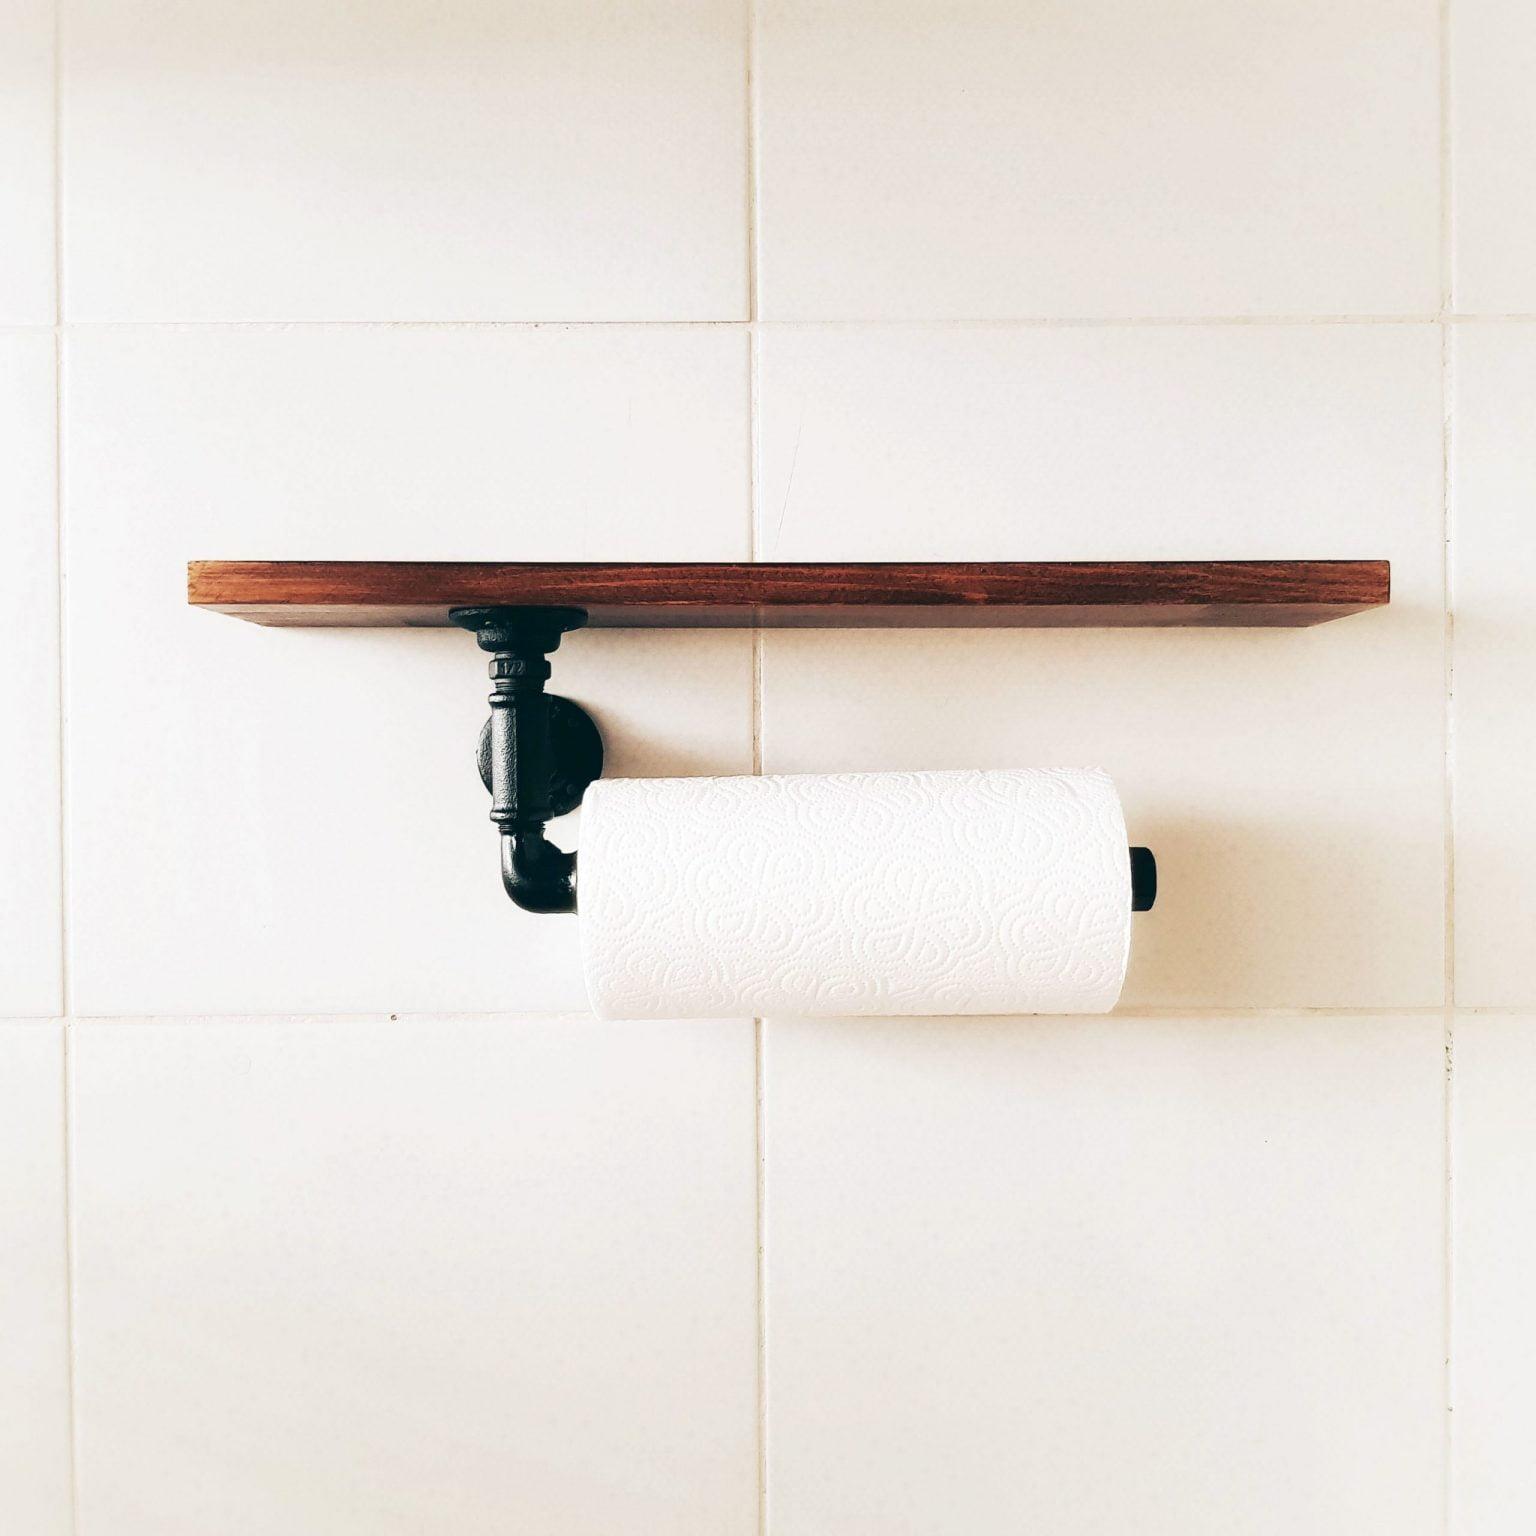 Endüstriyel Banyo Aksesuarları